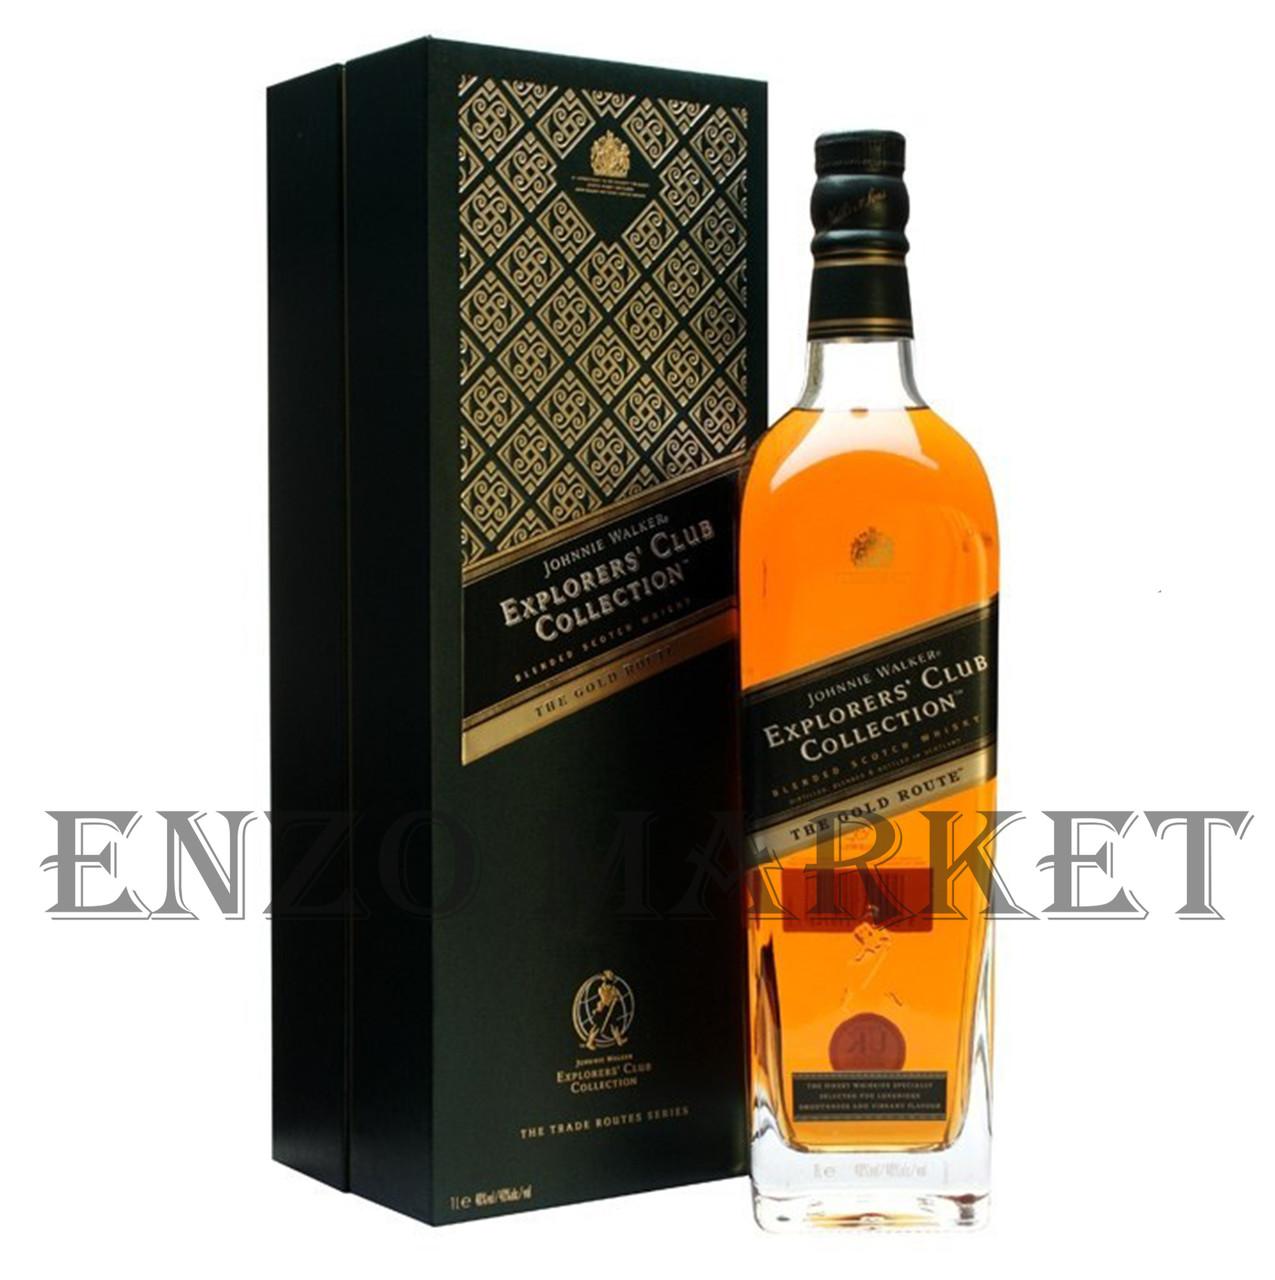 Виски Johnnie Walker Explorers Club Collection (Джонни Уокер Клуб Коллекция, Голд Роит) 40% 1 литр